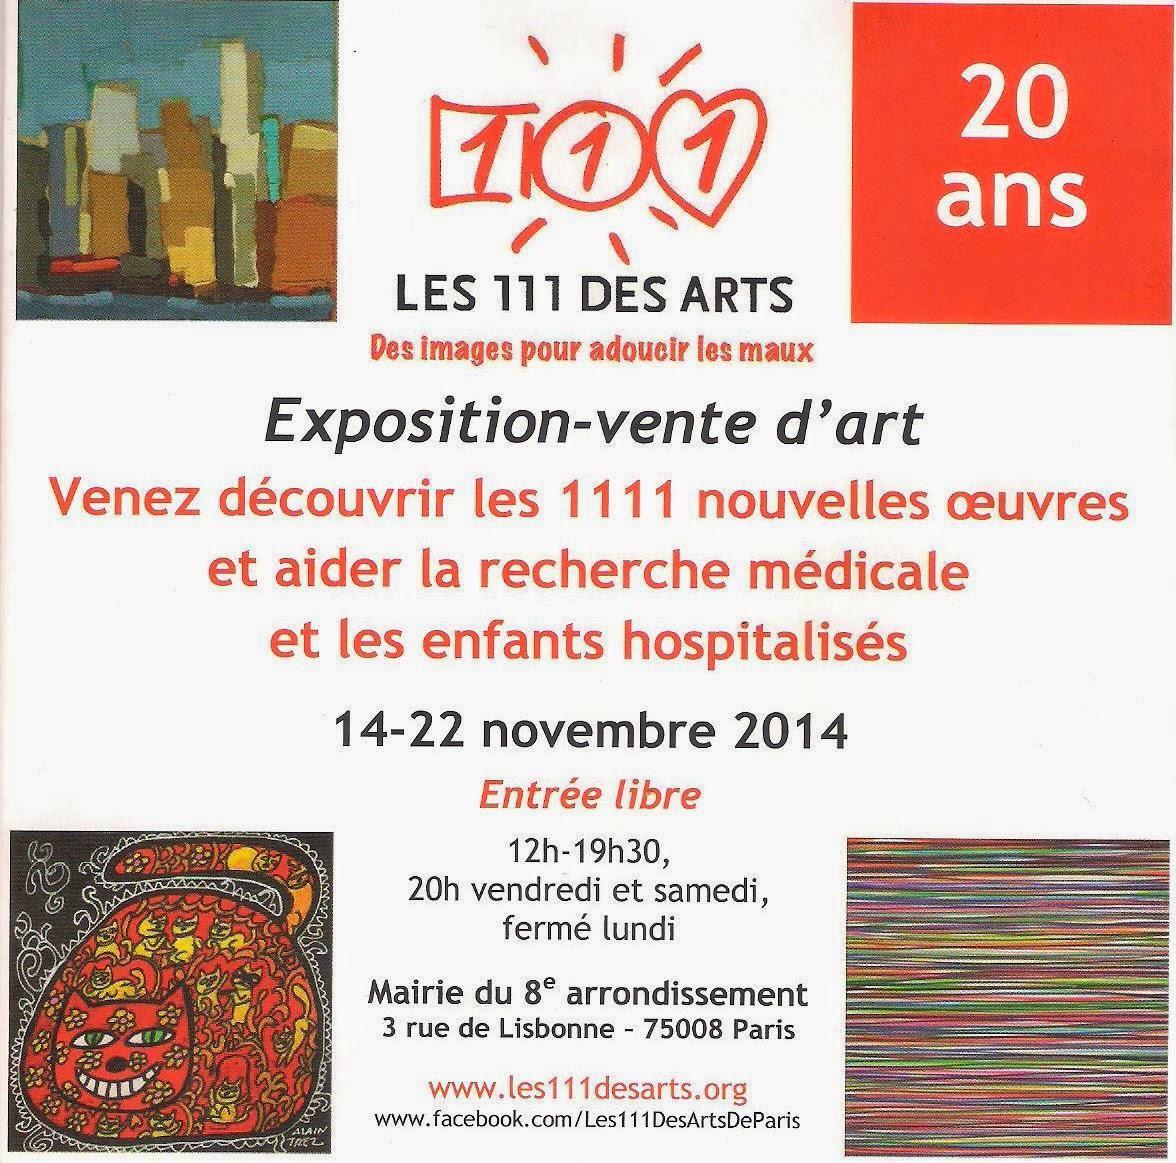 http://www.les111desarts.org/PARIS/Main.html